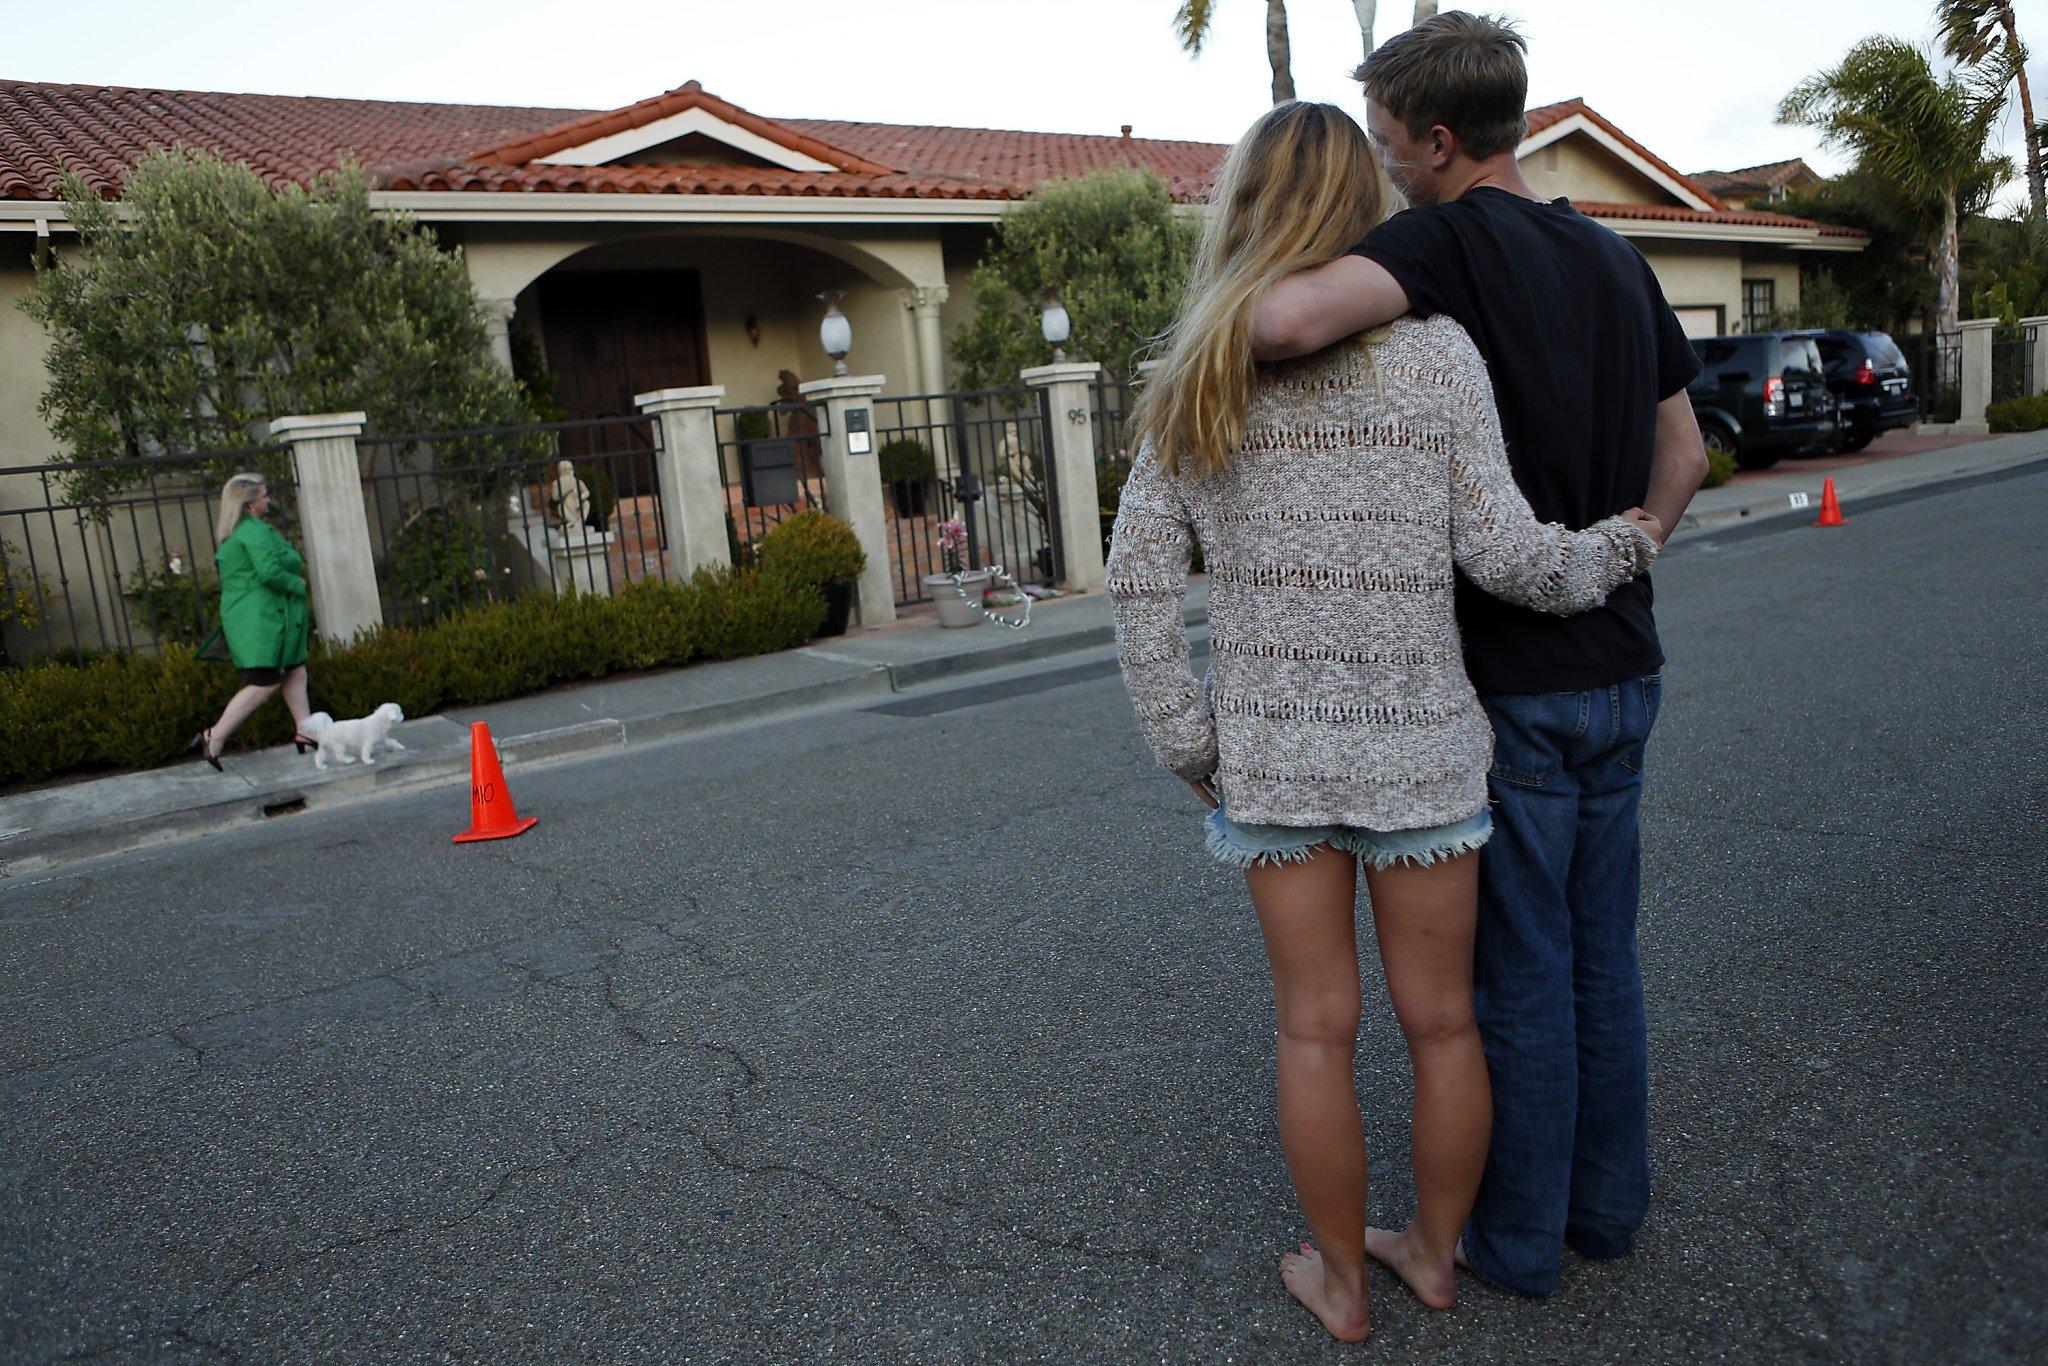 in robin williams tiburon neighborhood grief and fond memories sfgate - Robin Williams Houses